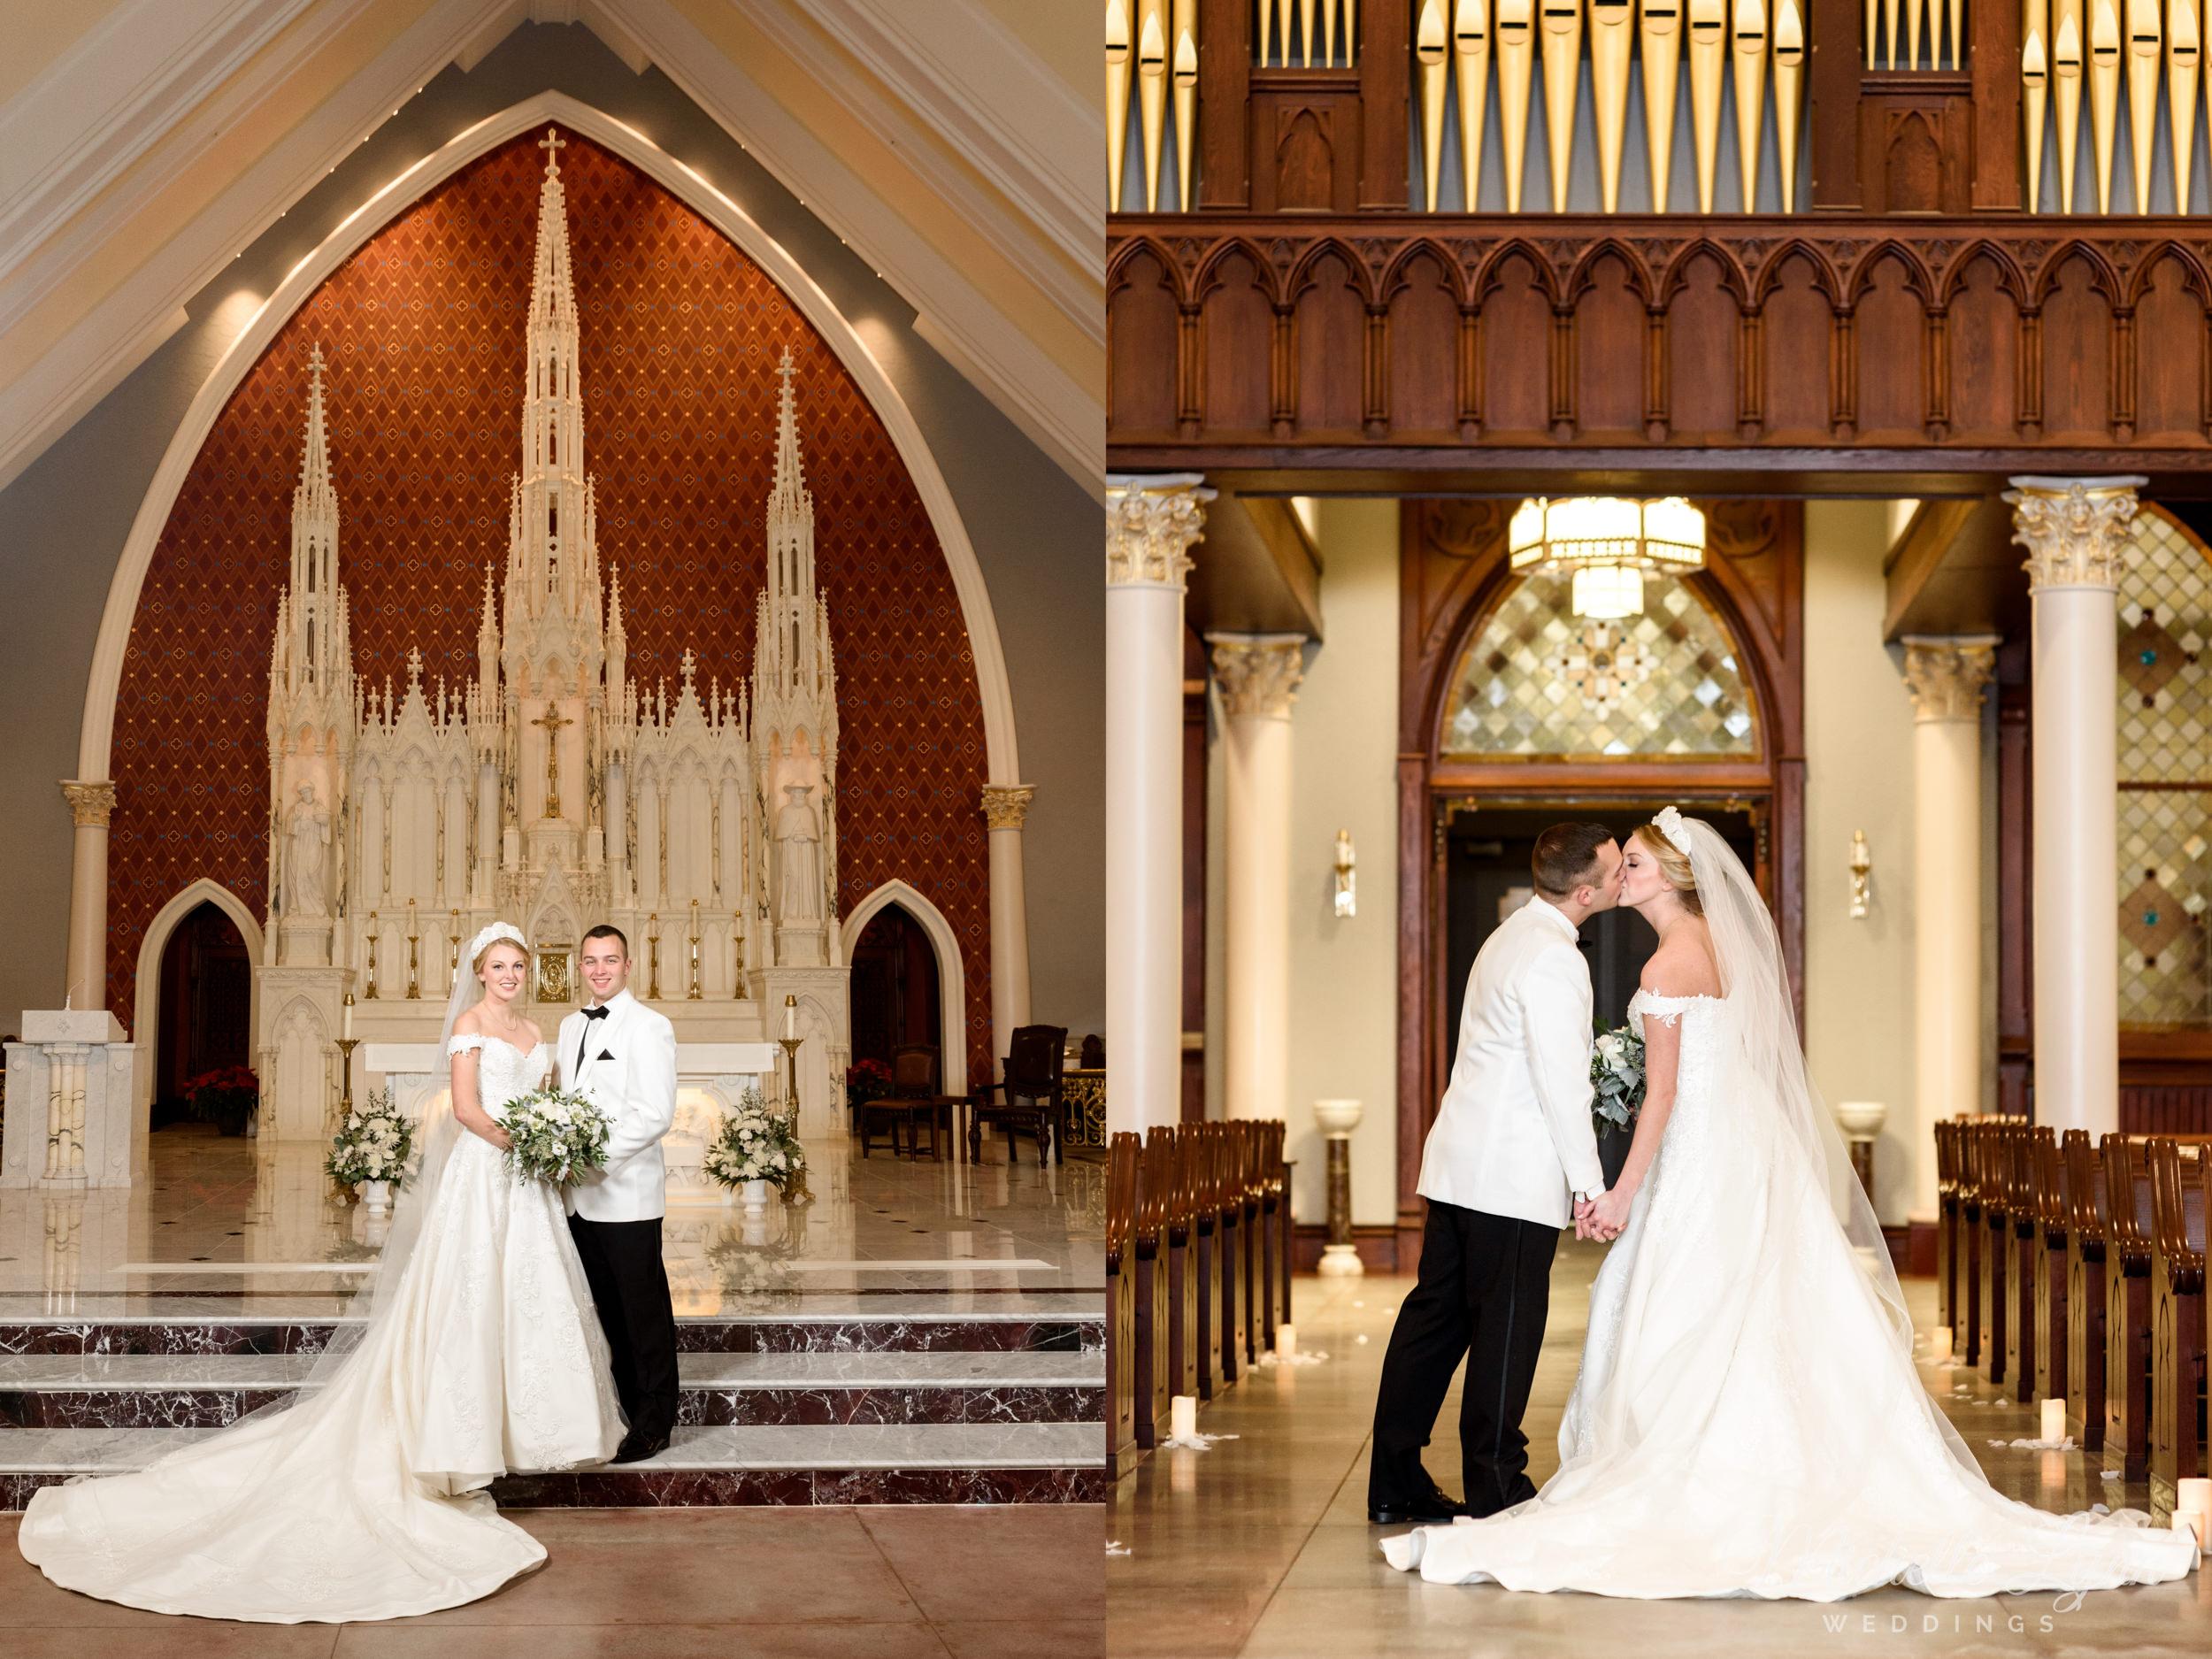 william-penn-inn-wedding-photography-mlw-67.jpg